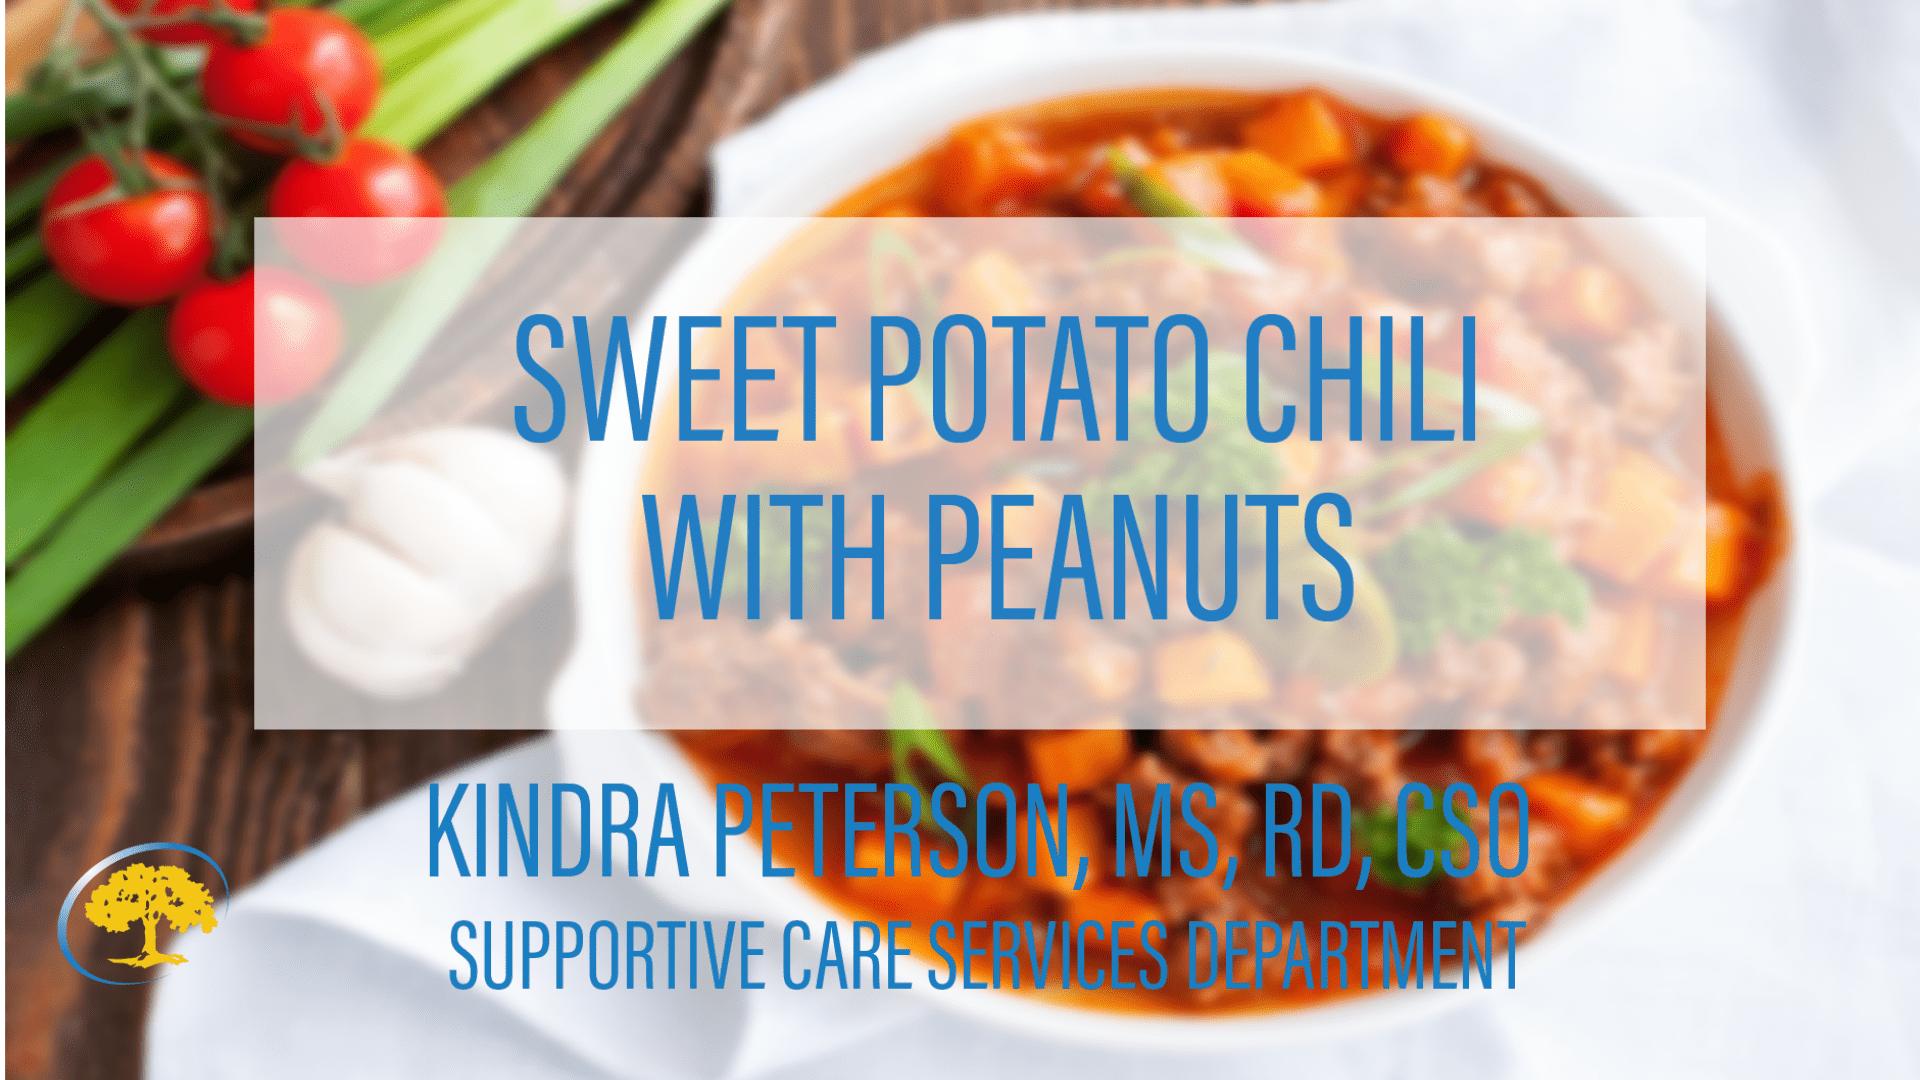 Sweet Potato Chili with Peanuts